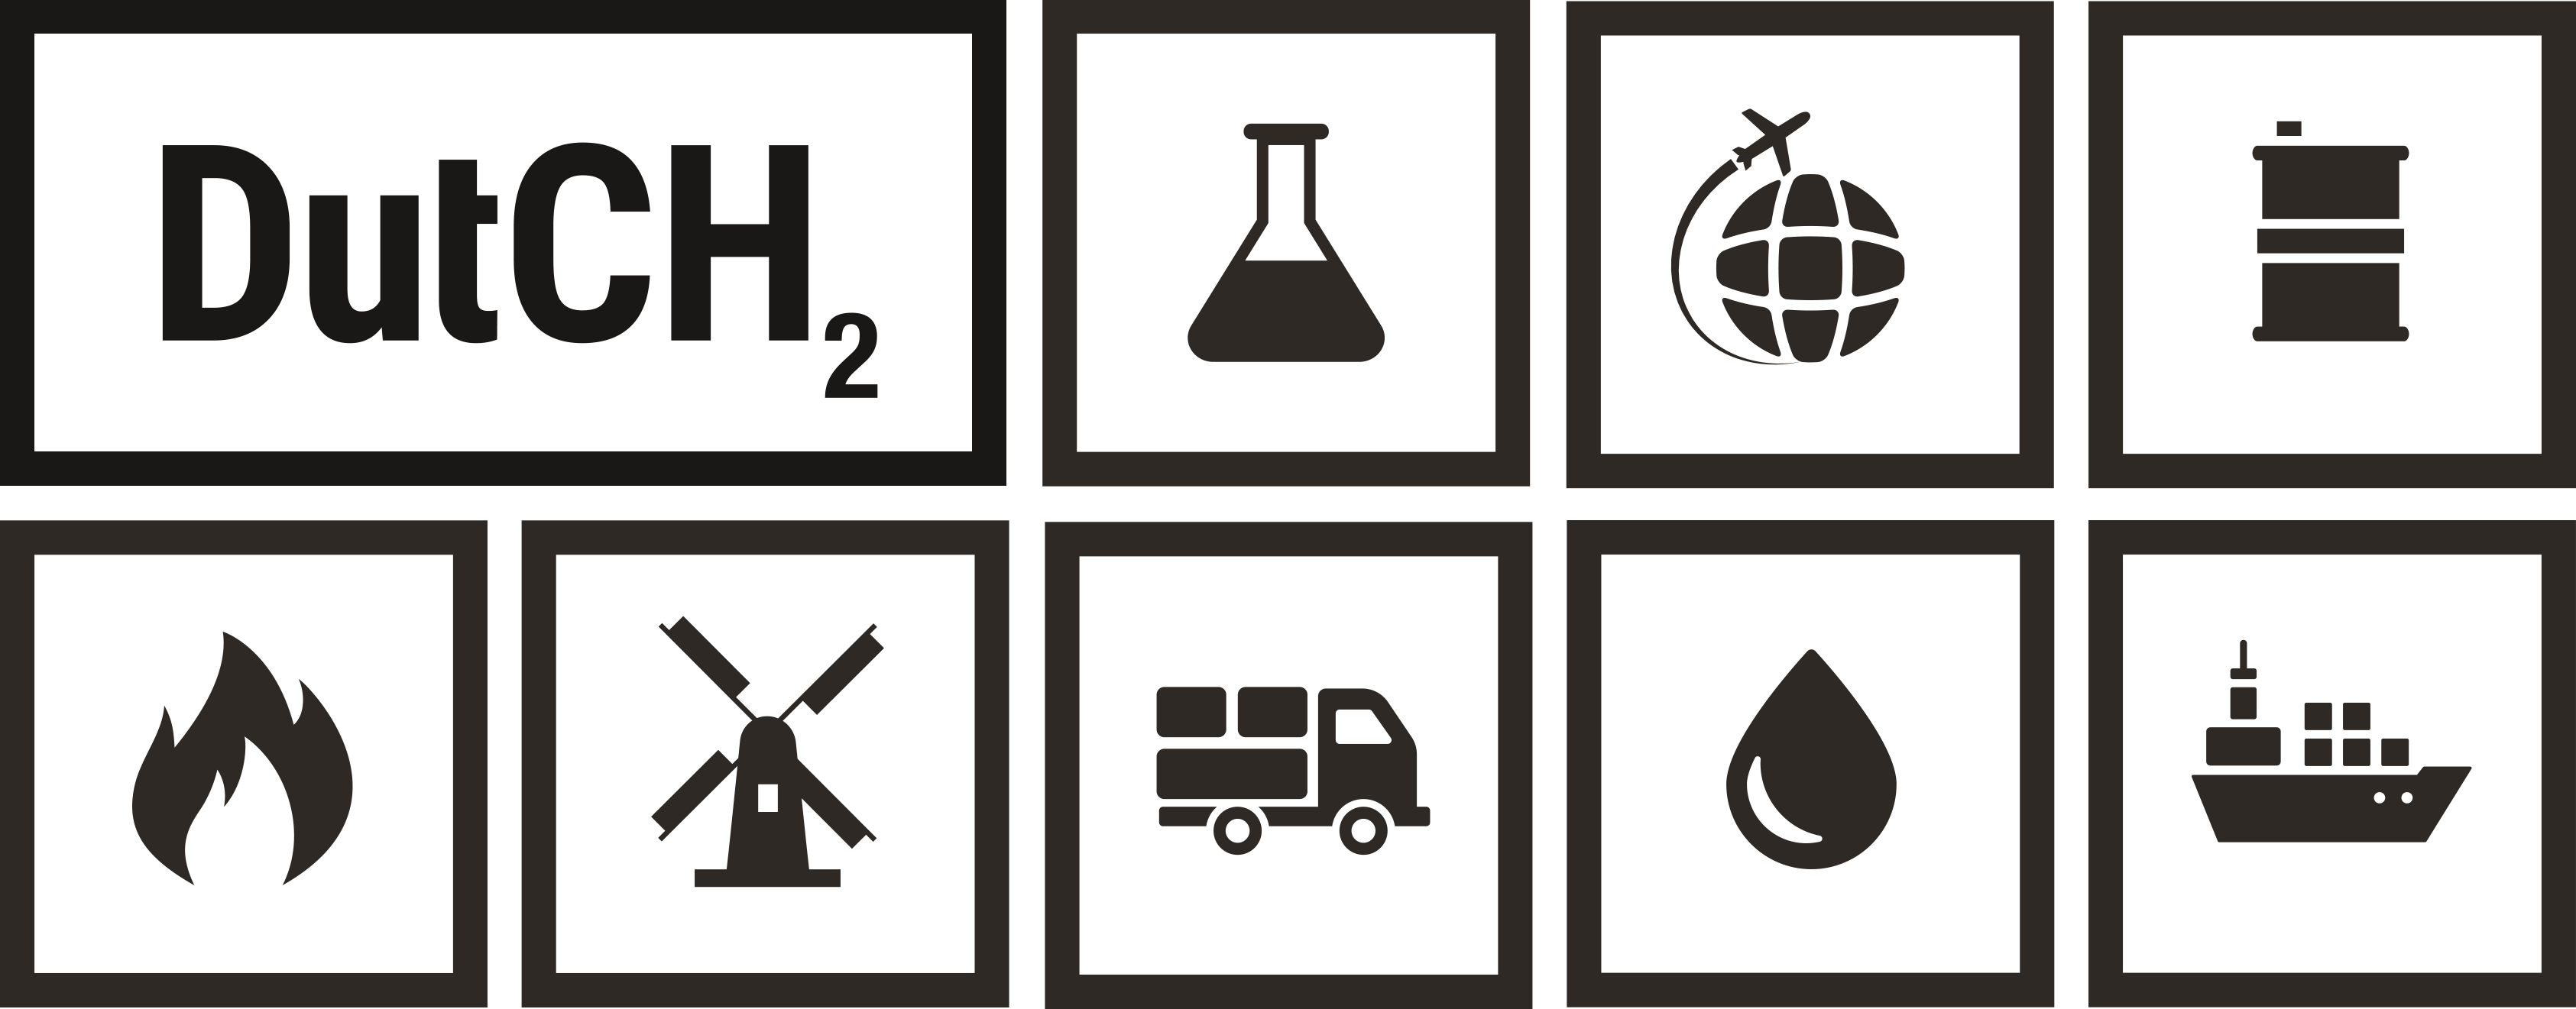 Nitric Acid Dutch2 Chemical Supplier